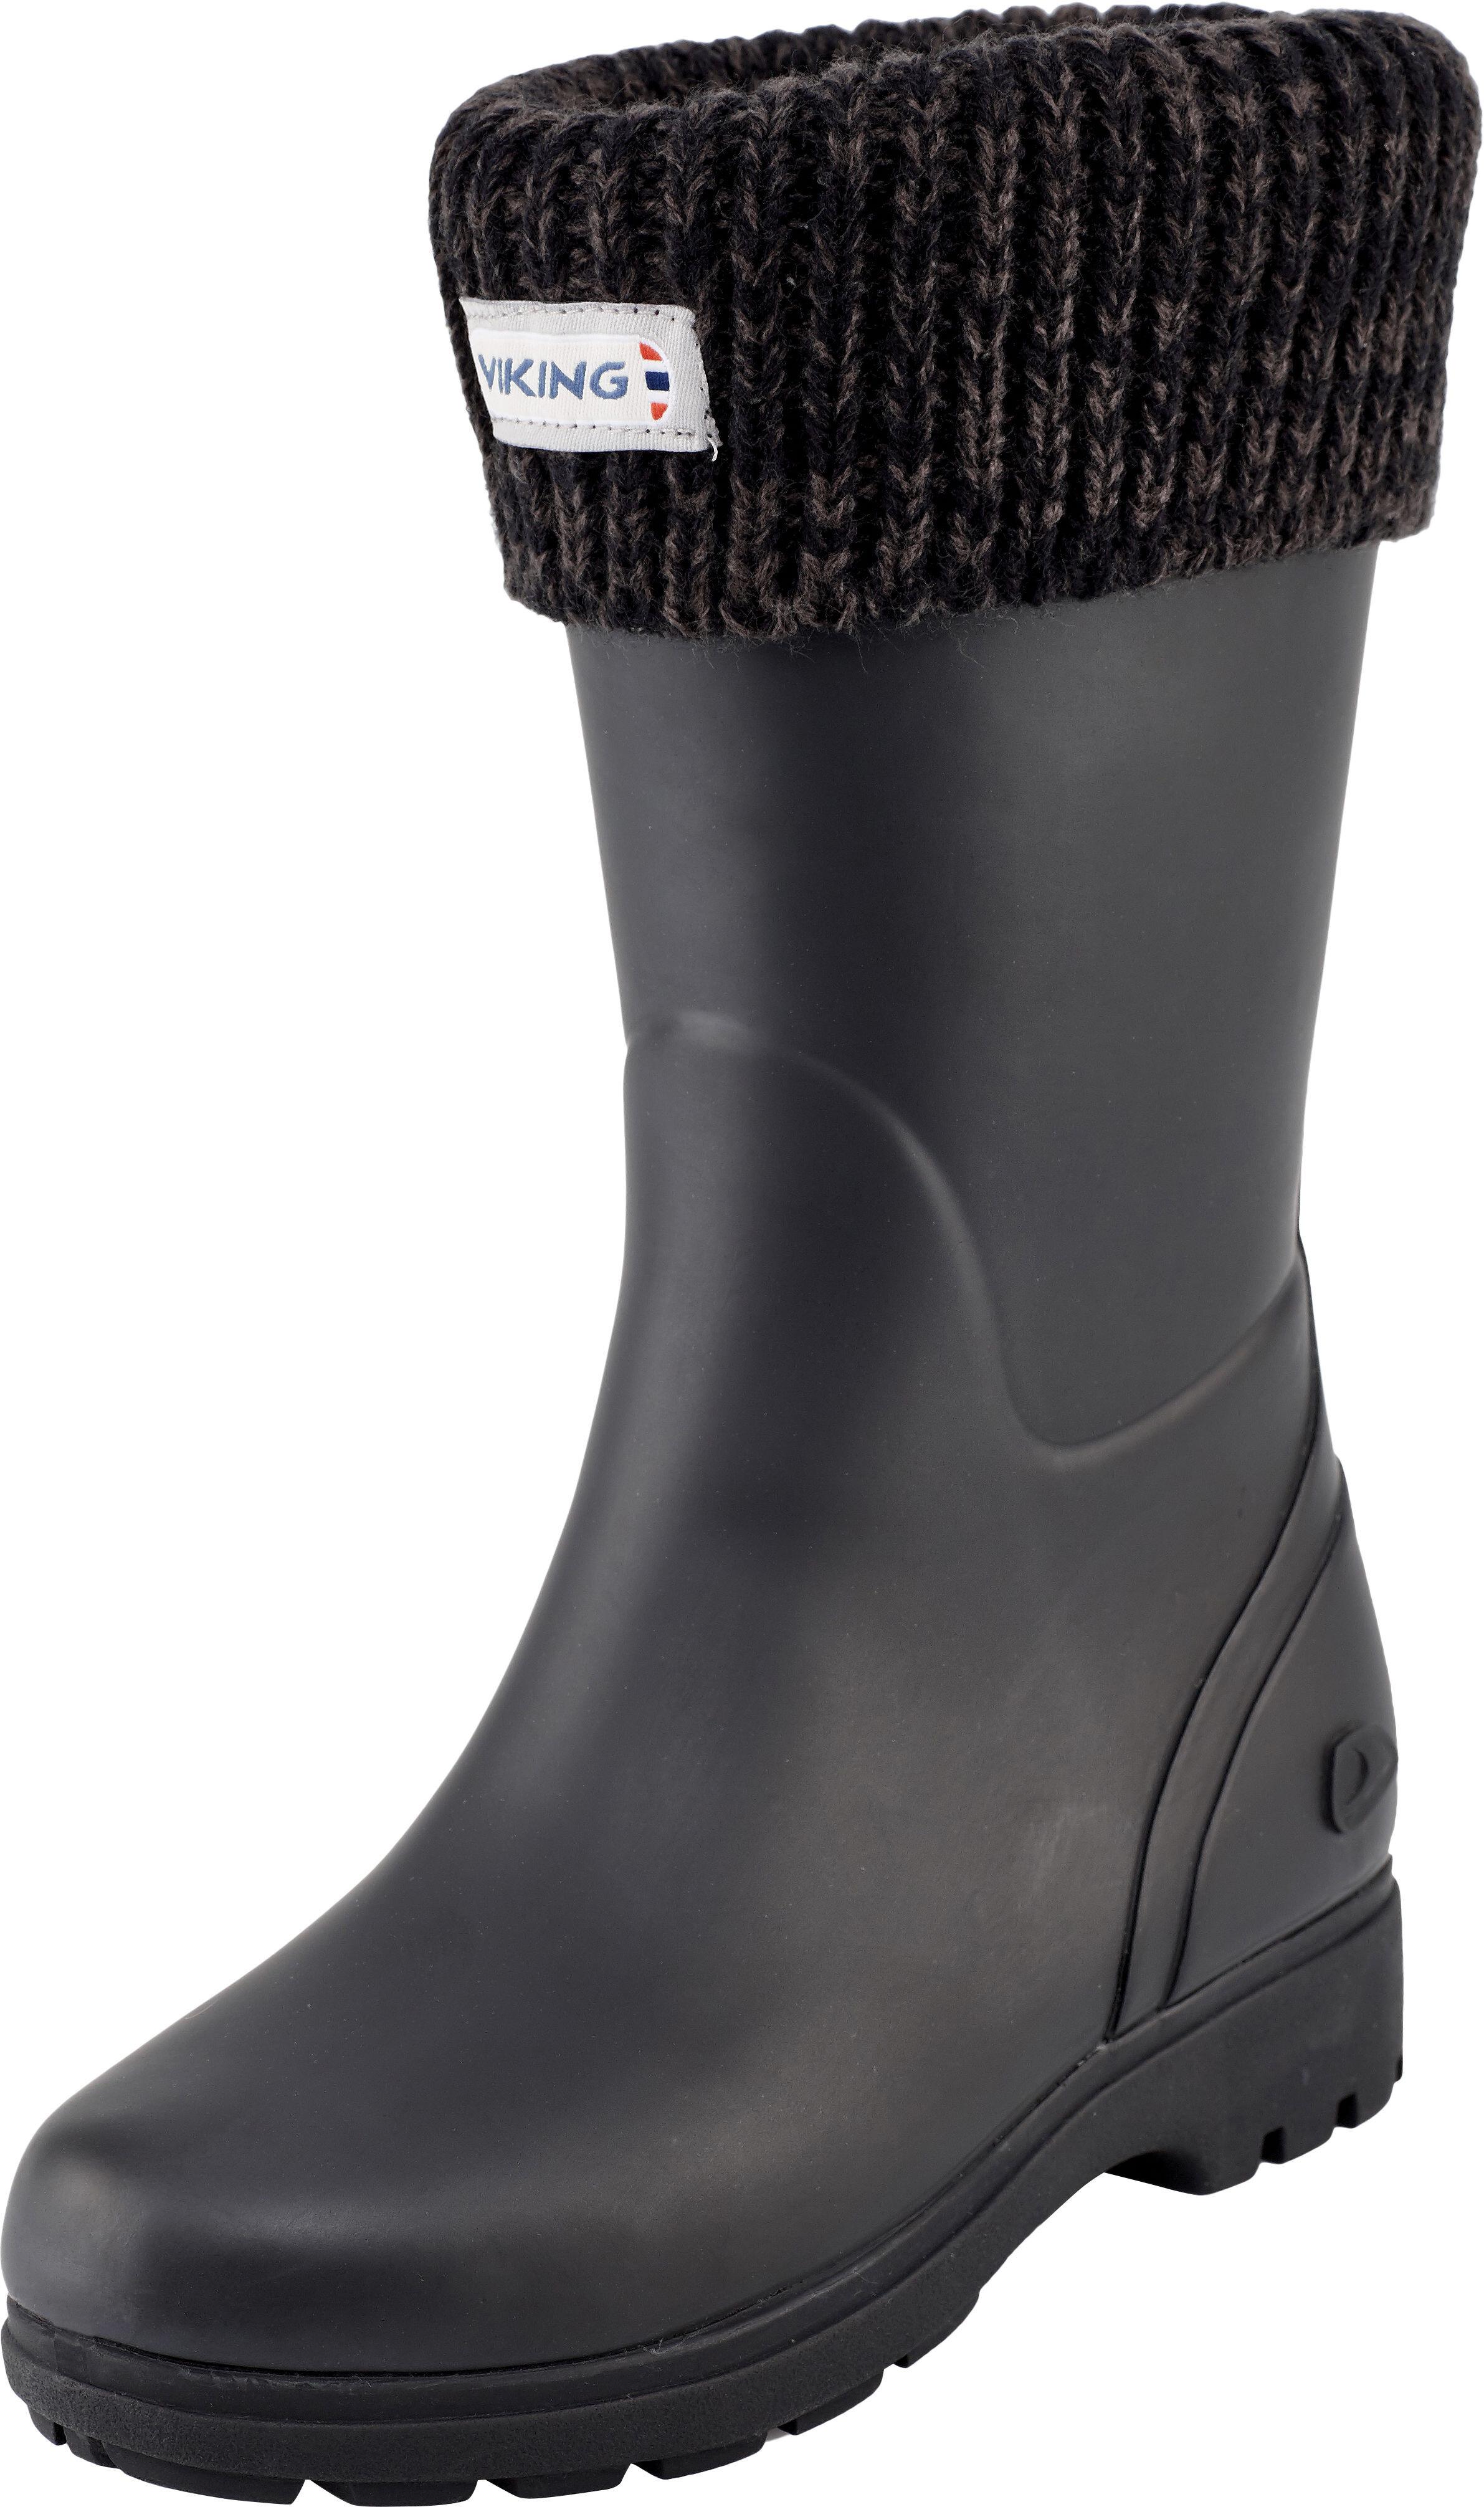 1a34b707efea Viking Footwear Mira Warm Gummistøvler Børn sort